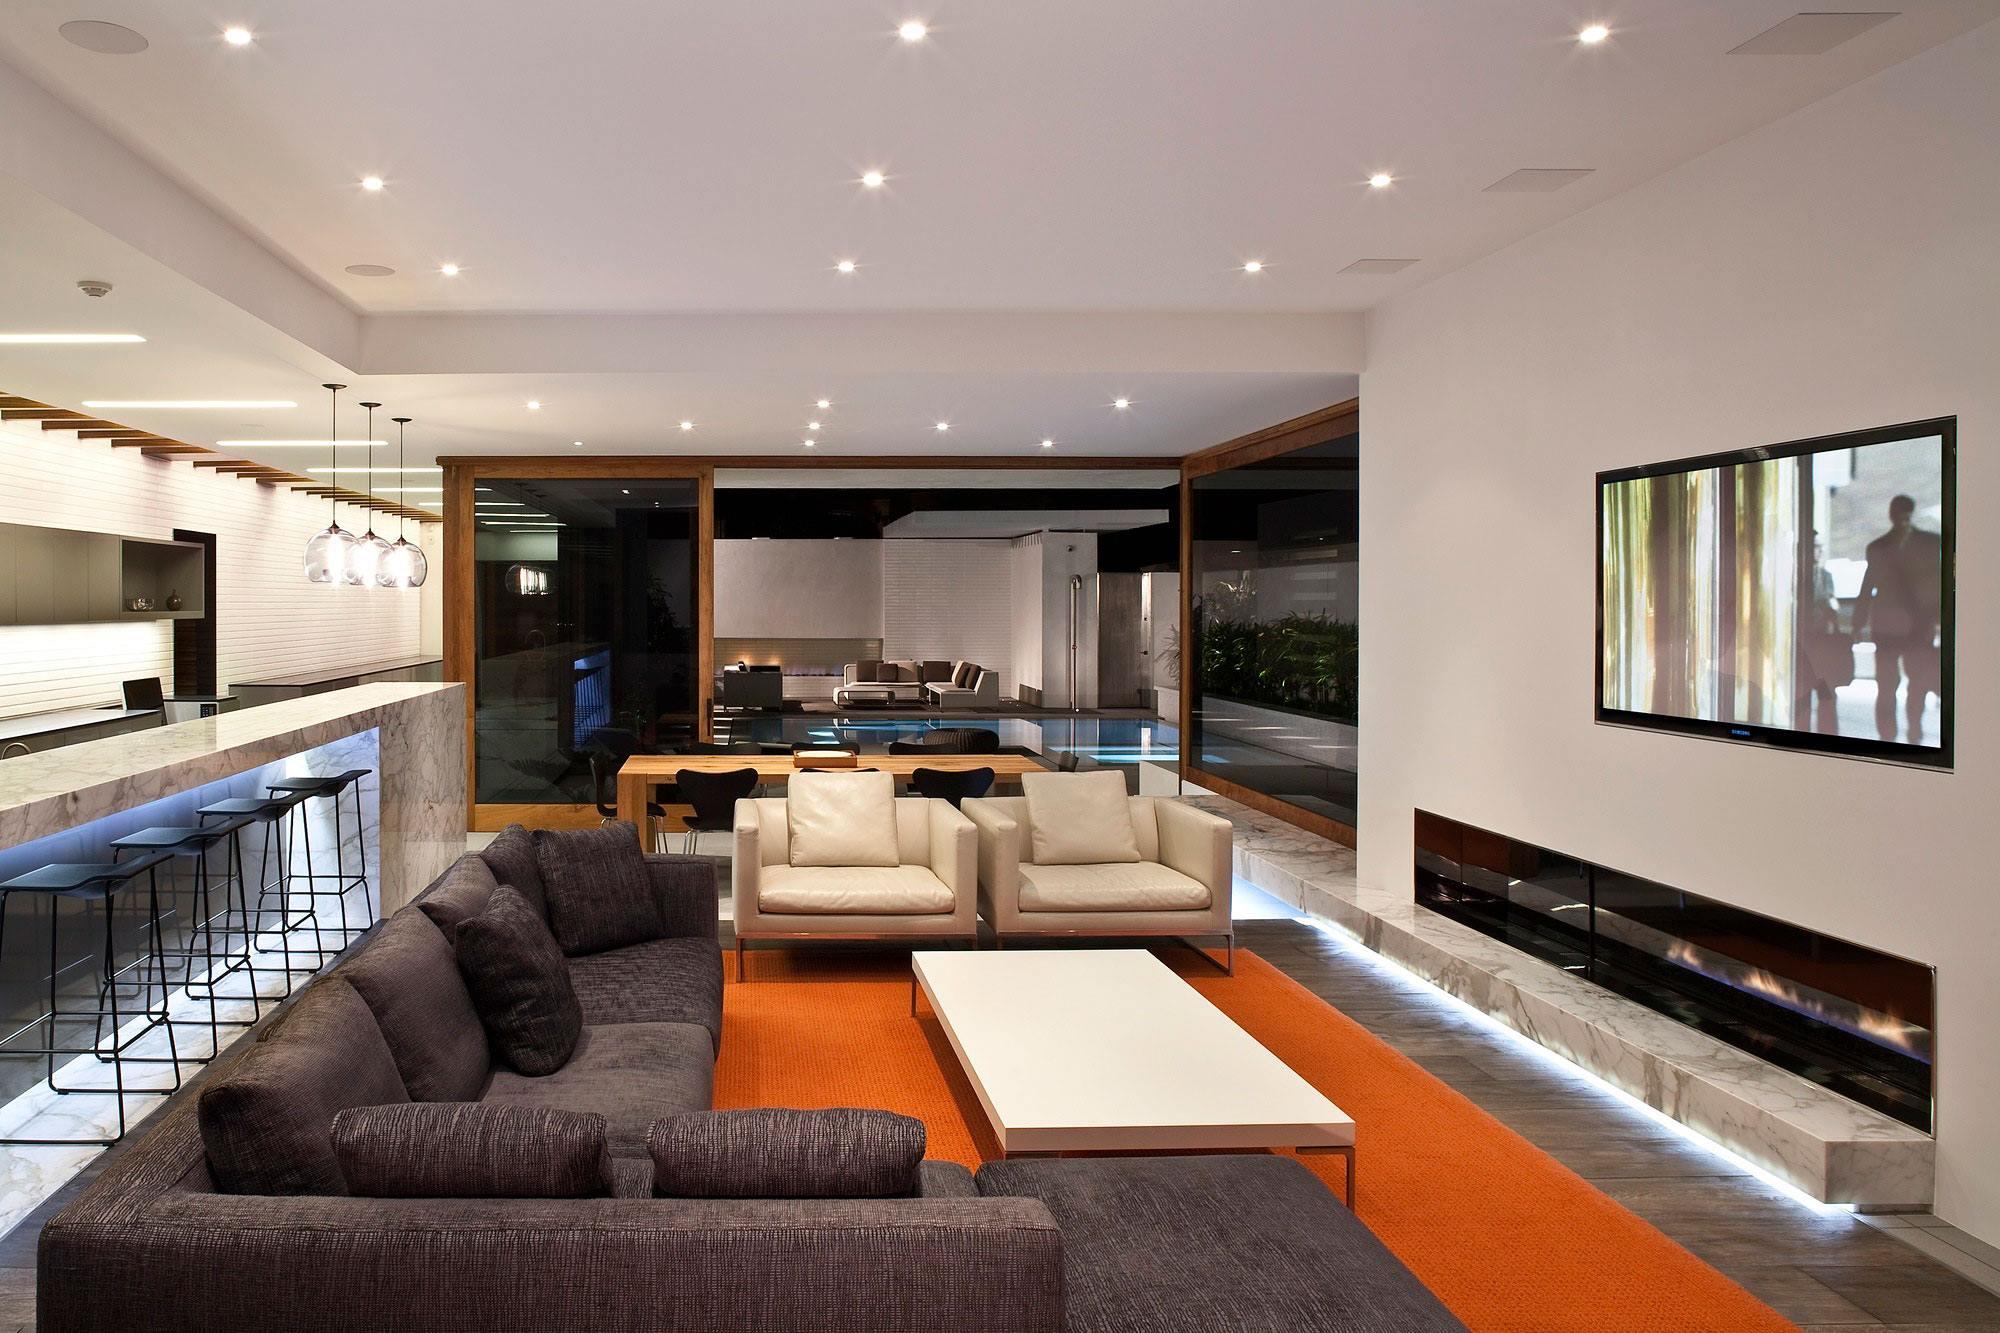 Lujosa arquitectura moderna con elegante dise o de - Arquitectura de diseno ...